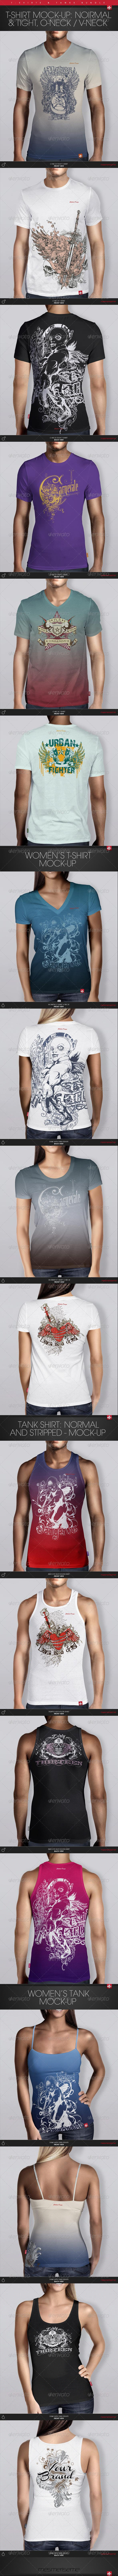 GraphicRiver T-shirts & Tanks Women and Men Bundle 6386155